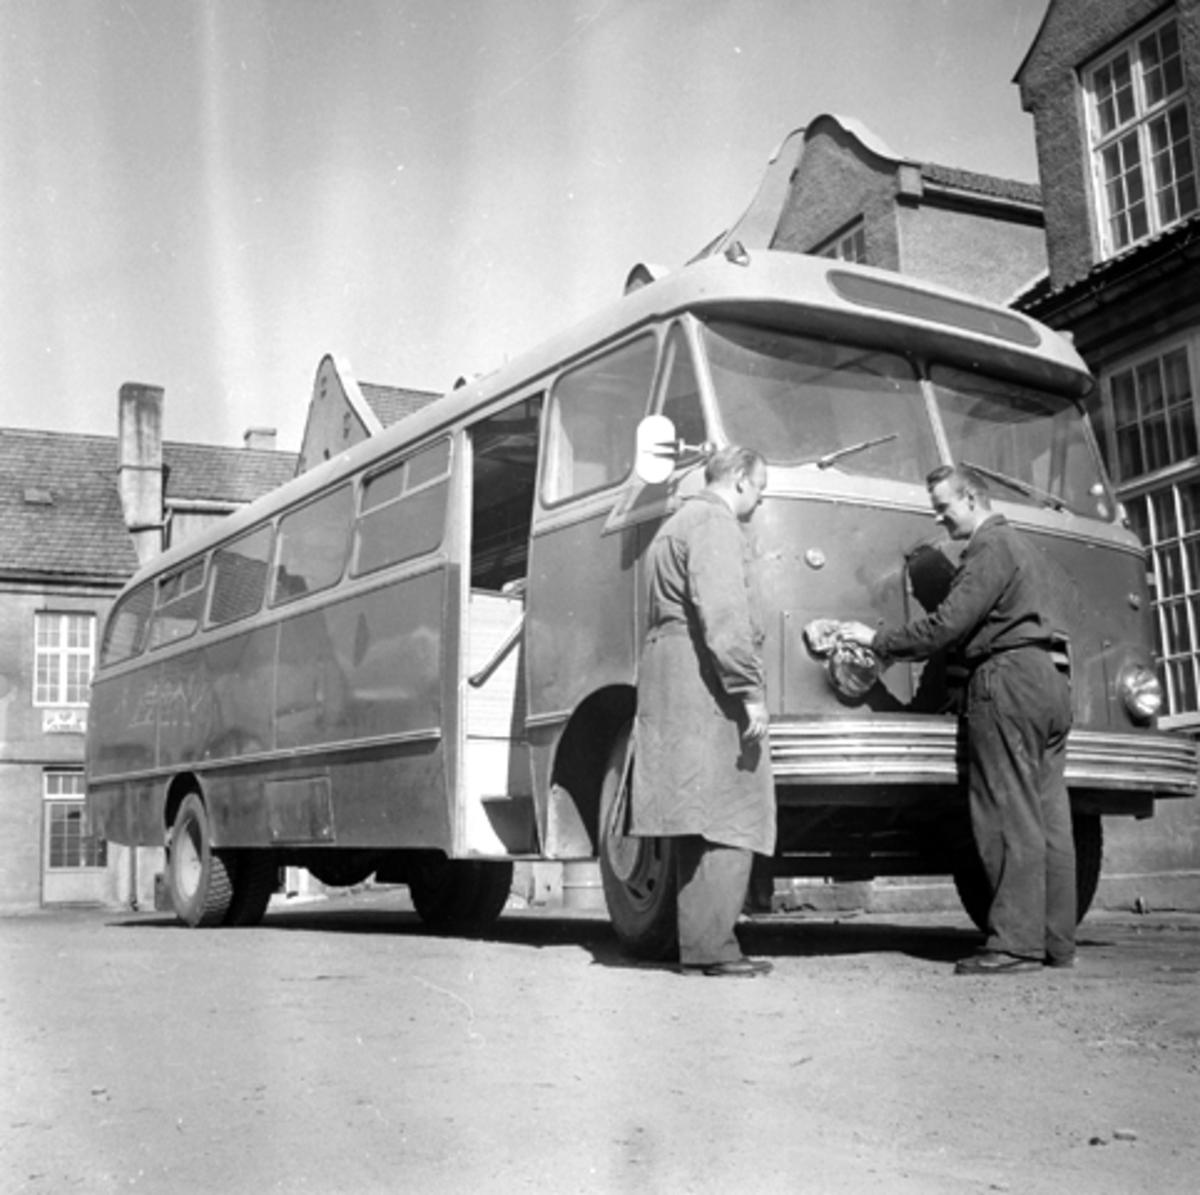 Buss foran Oustad. To menn foran en buss.